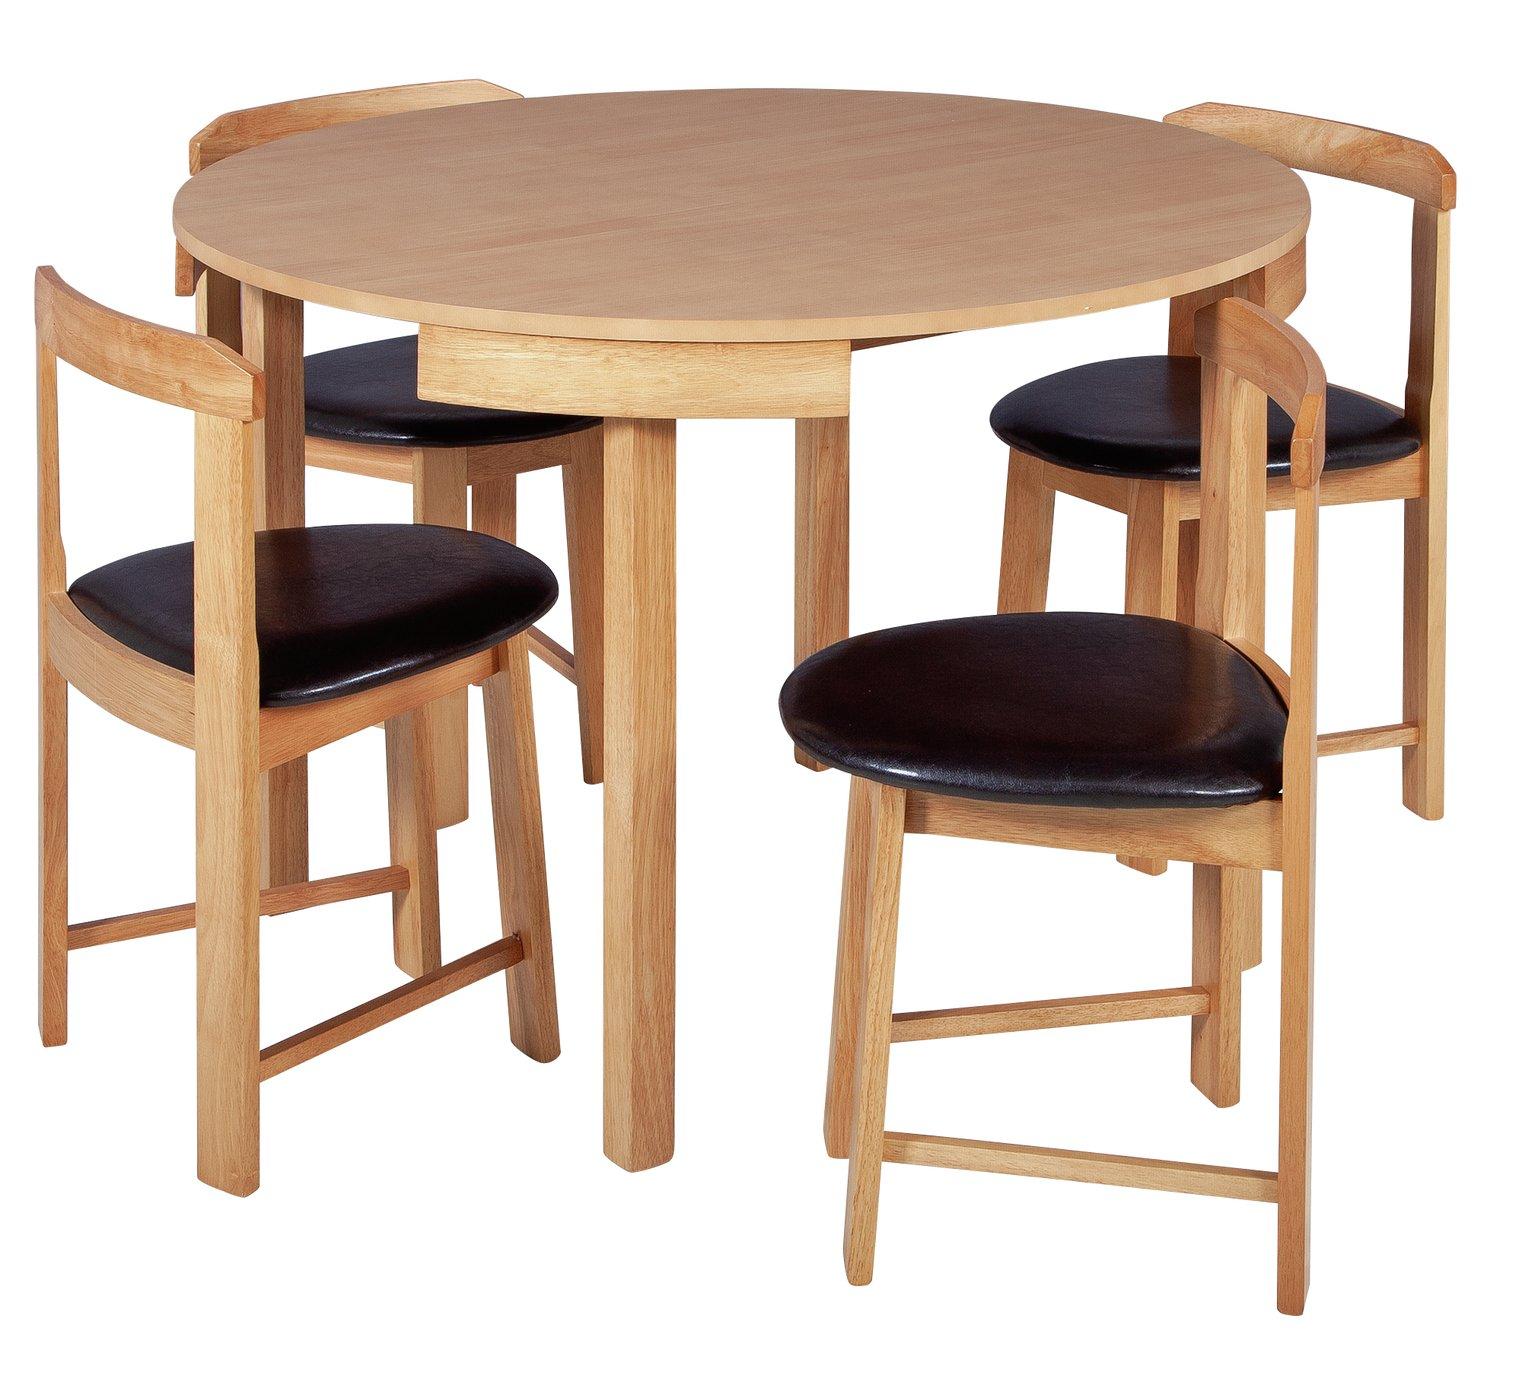 Argos Home Alena Circular Solid Wood Table & 4 Chairs - Oak